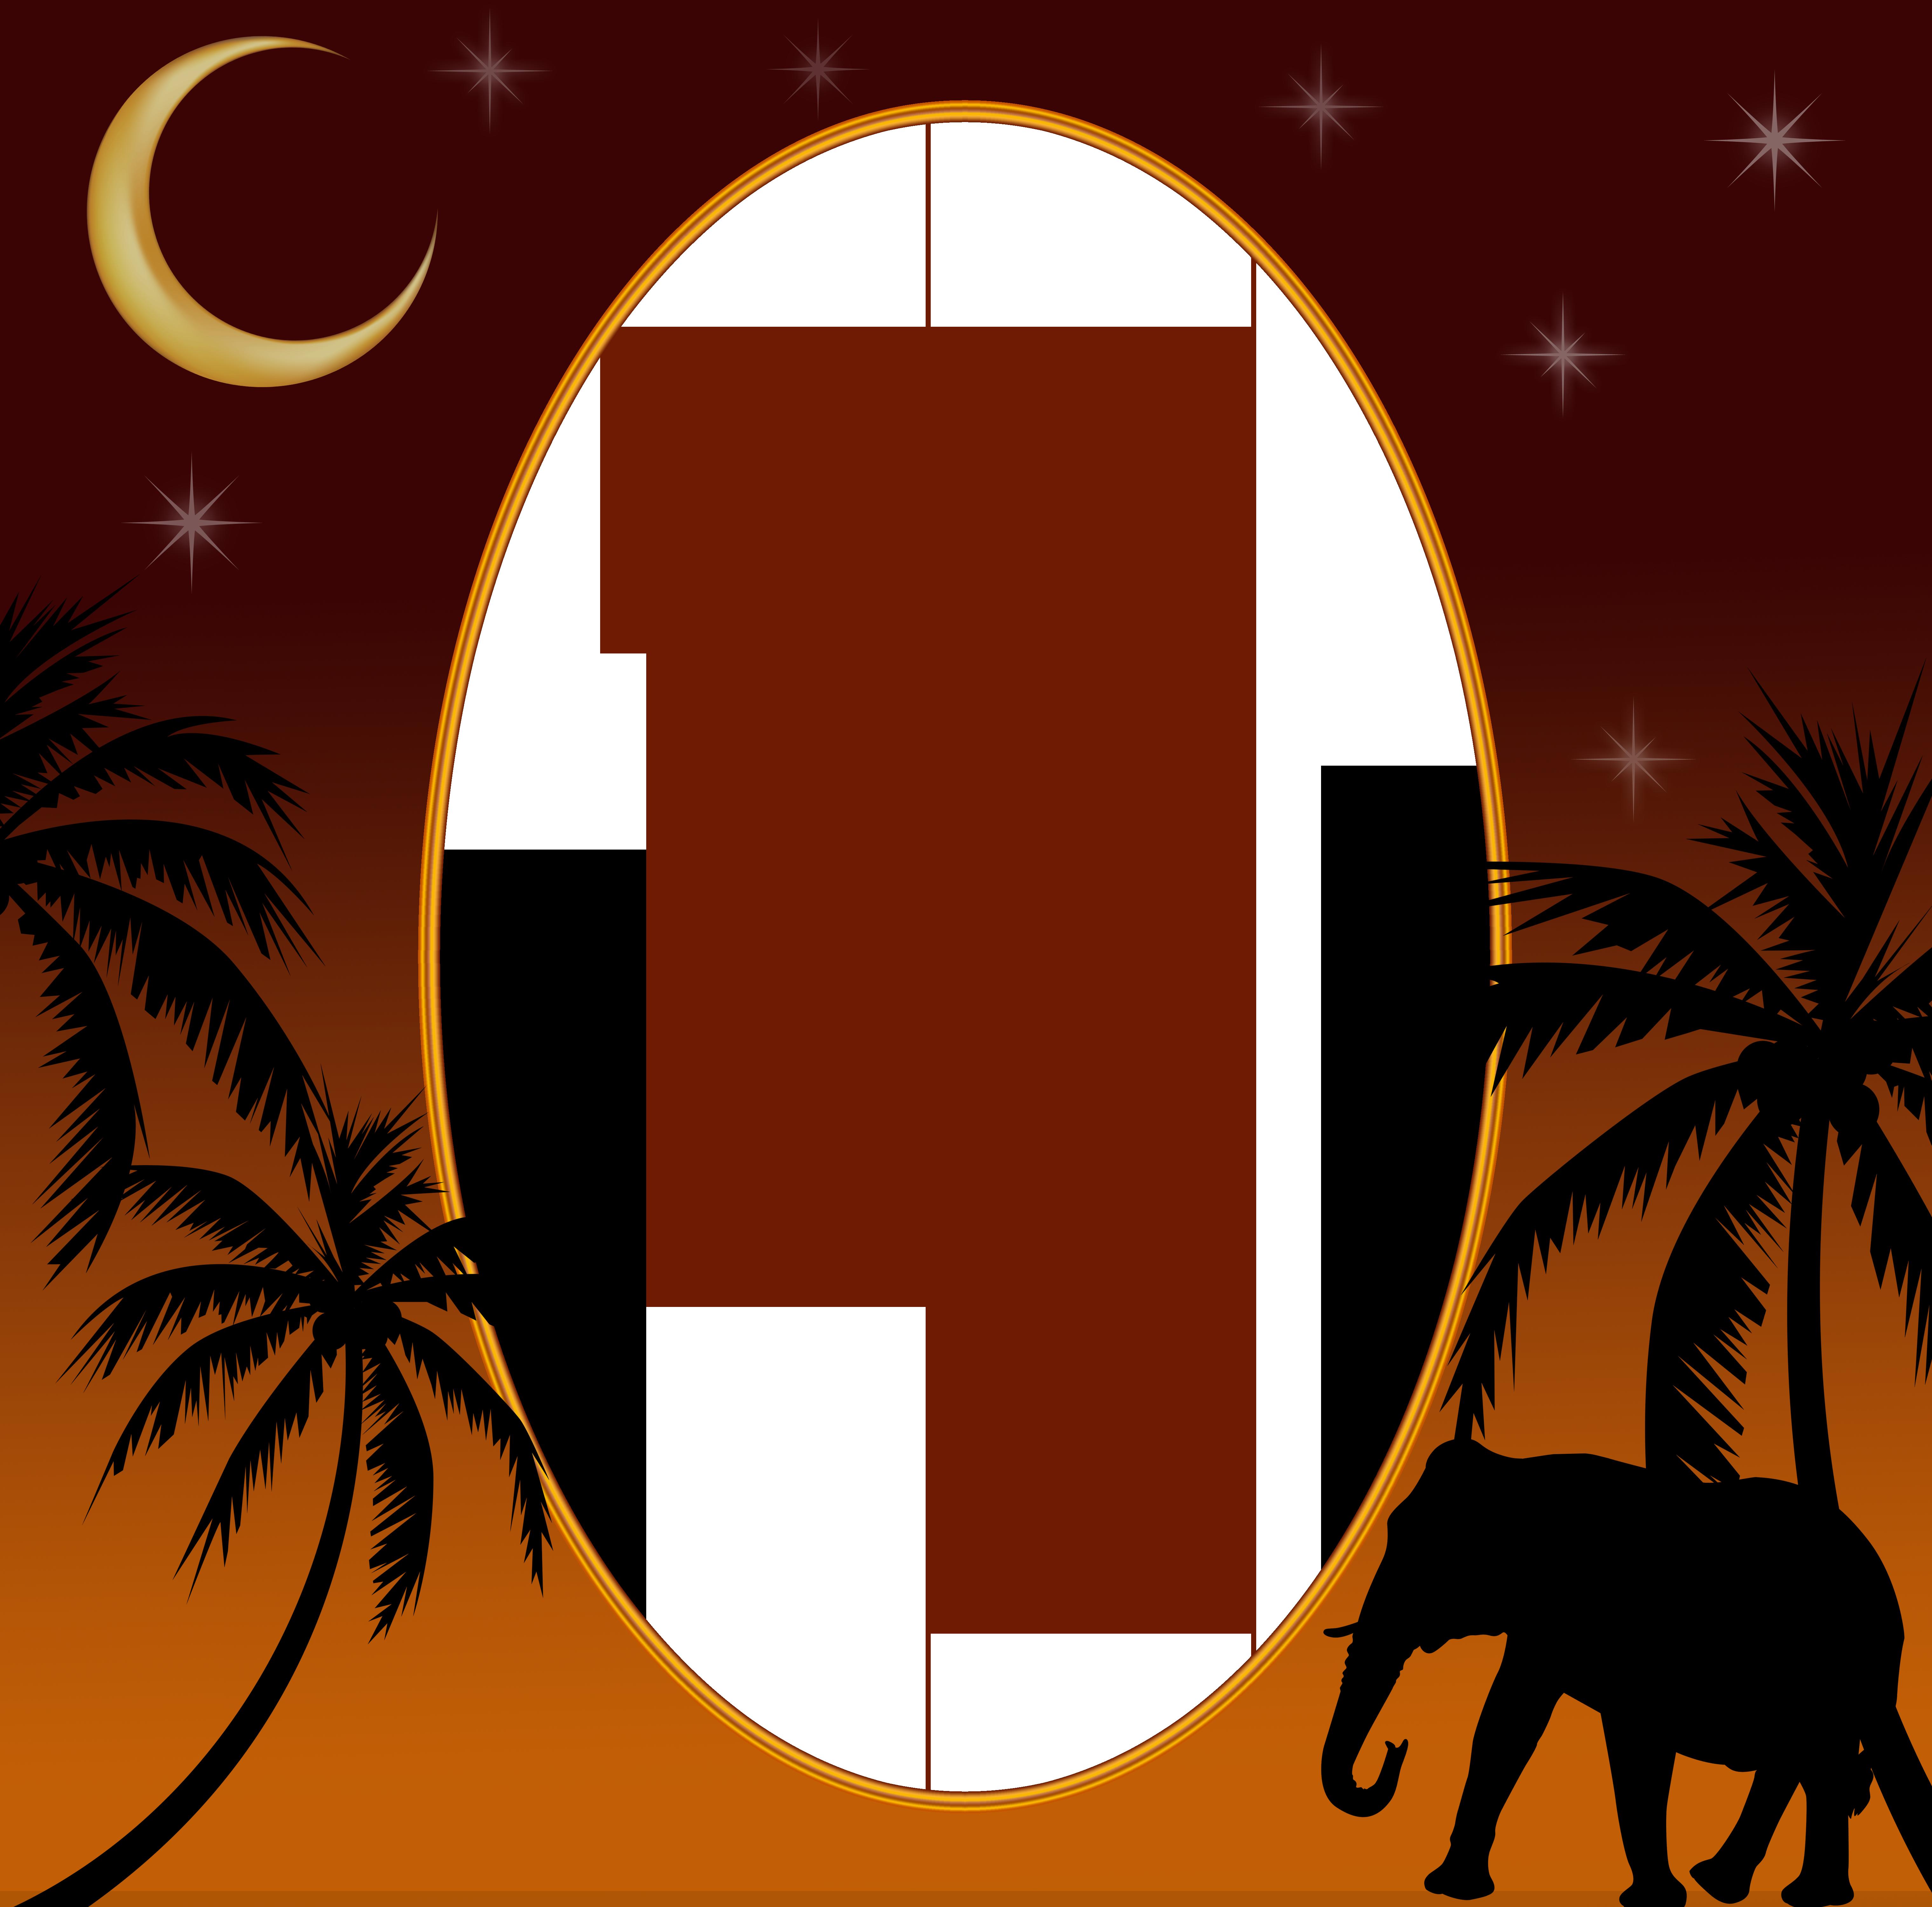 Night clipart night landscape. Jungle png transparent frame